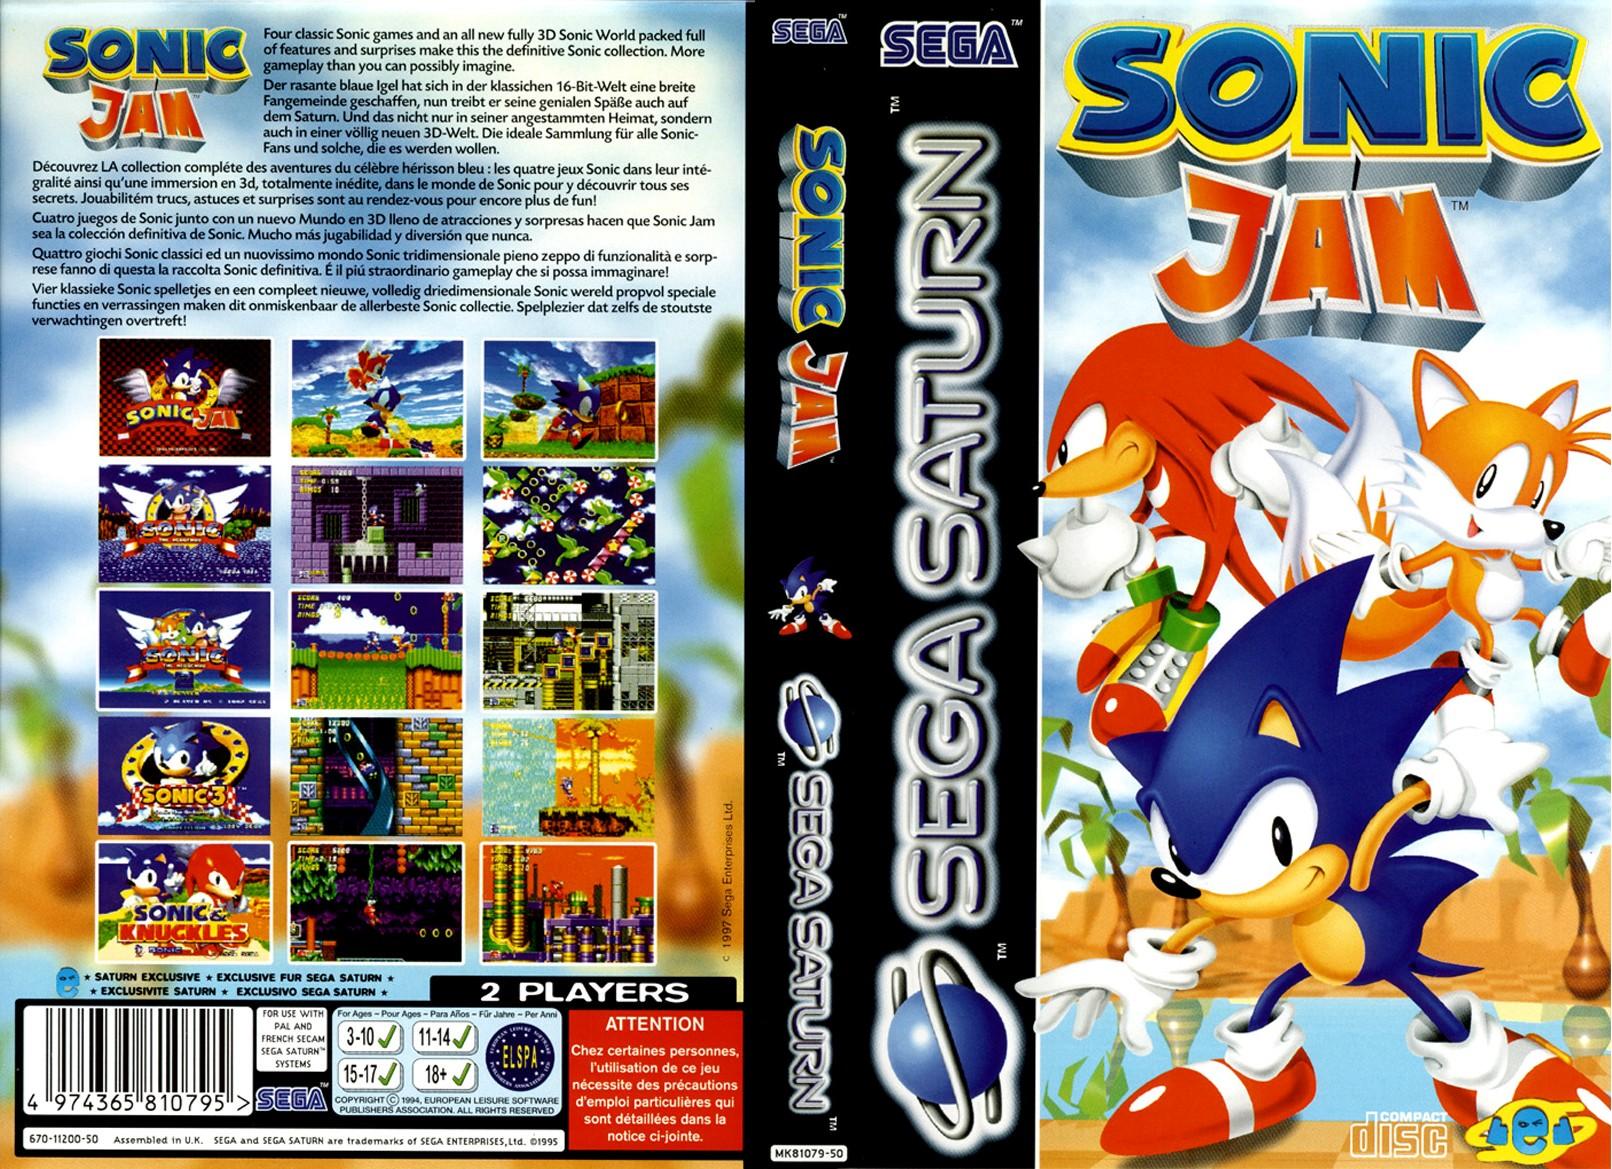 Sega Saturn S Sonic Jam E Game Covers Box Scans Box Art CD